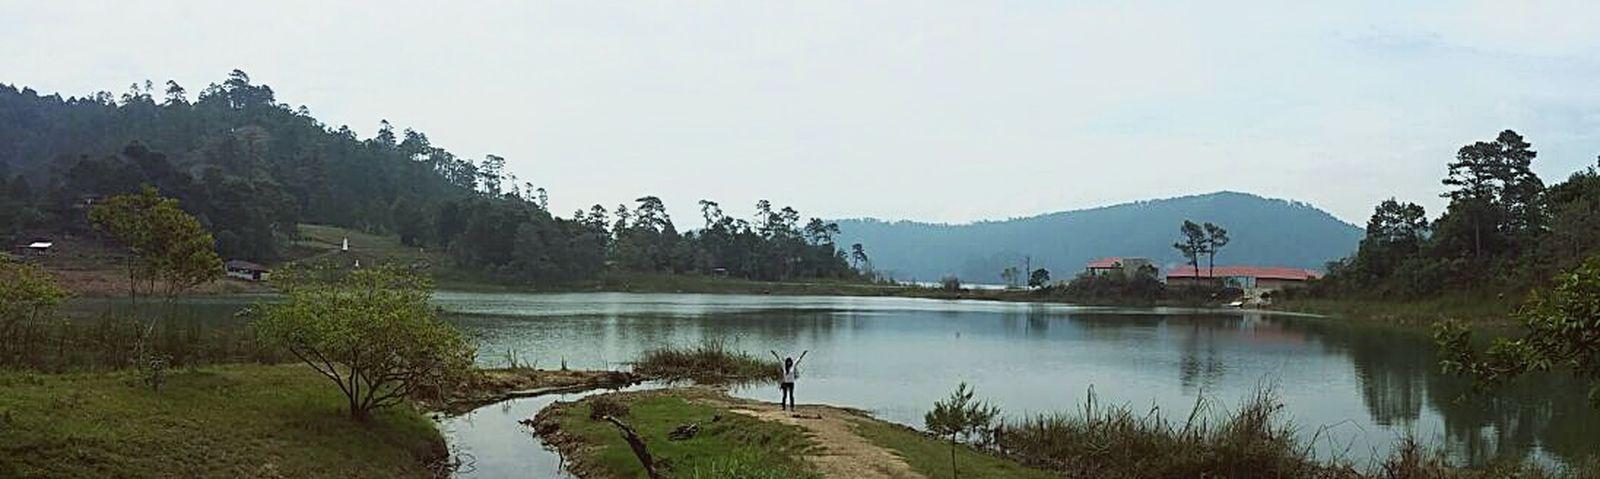 Reflection Water Nature No People Colors Travel Destinations Woman Happiness Chiapas tradicione FolkloreAmorypaz Beauty In Nature Frontera Laguna Mexico Mexico_maravilloso